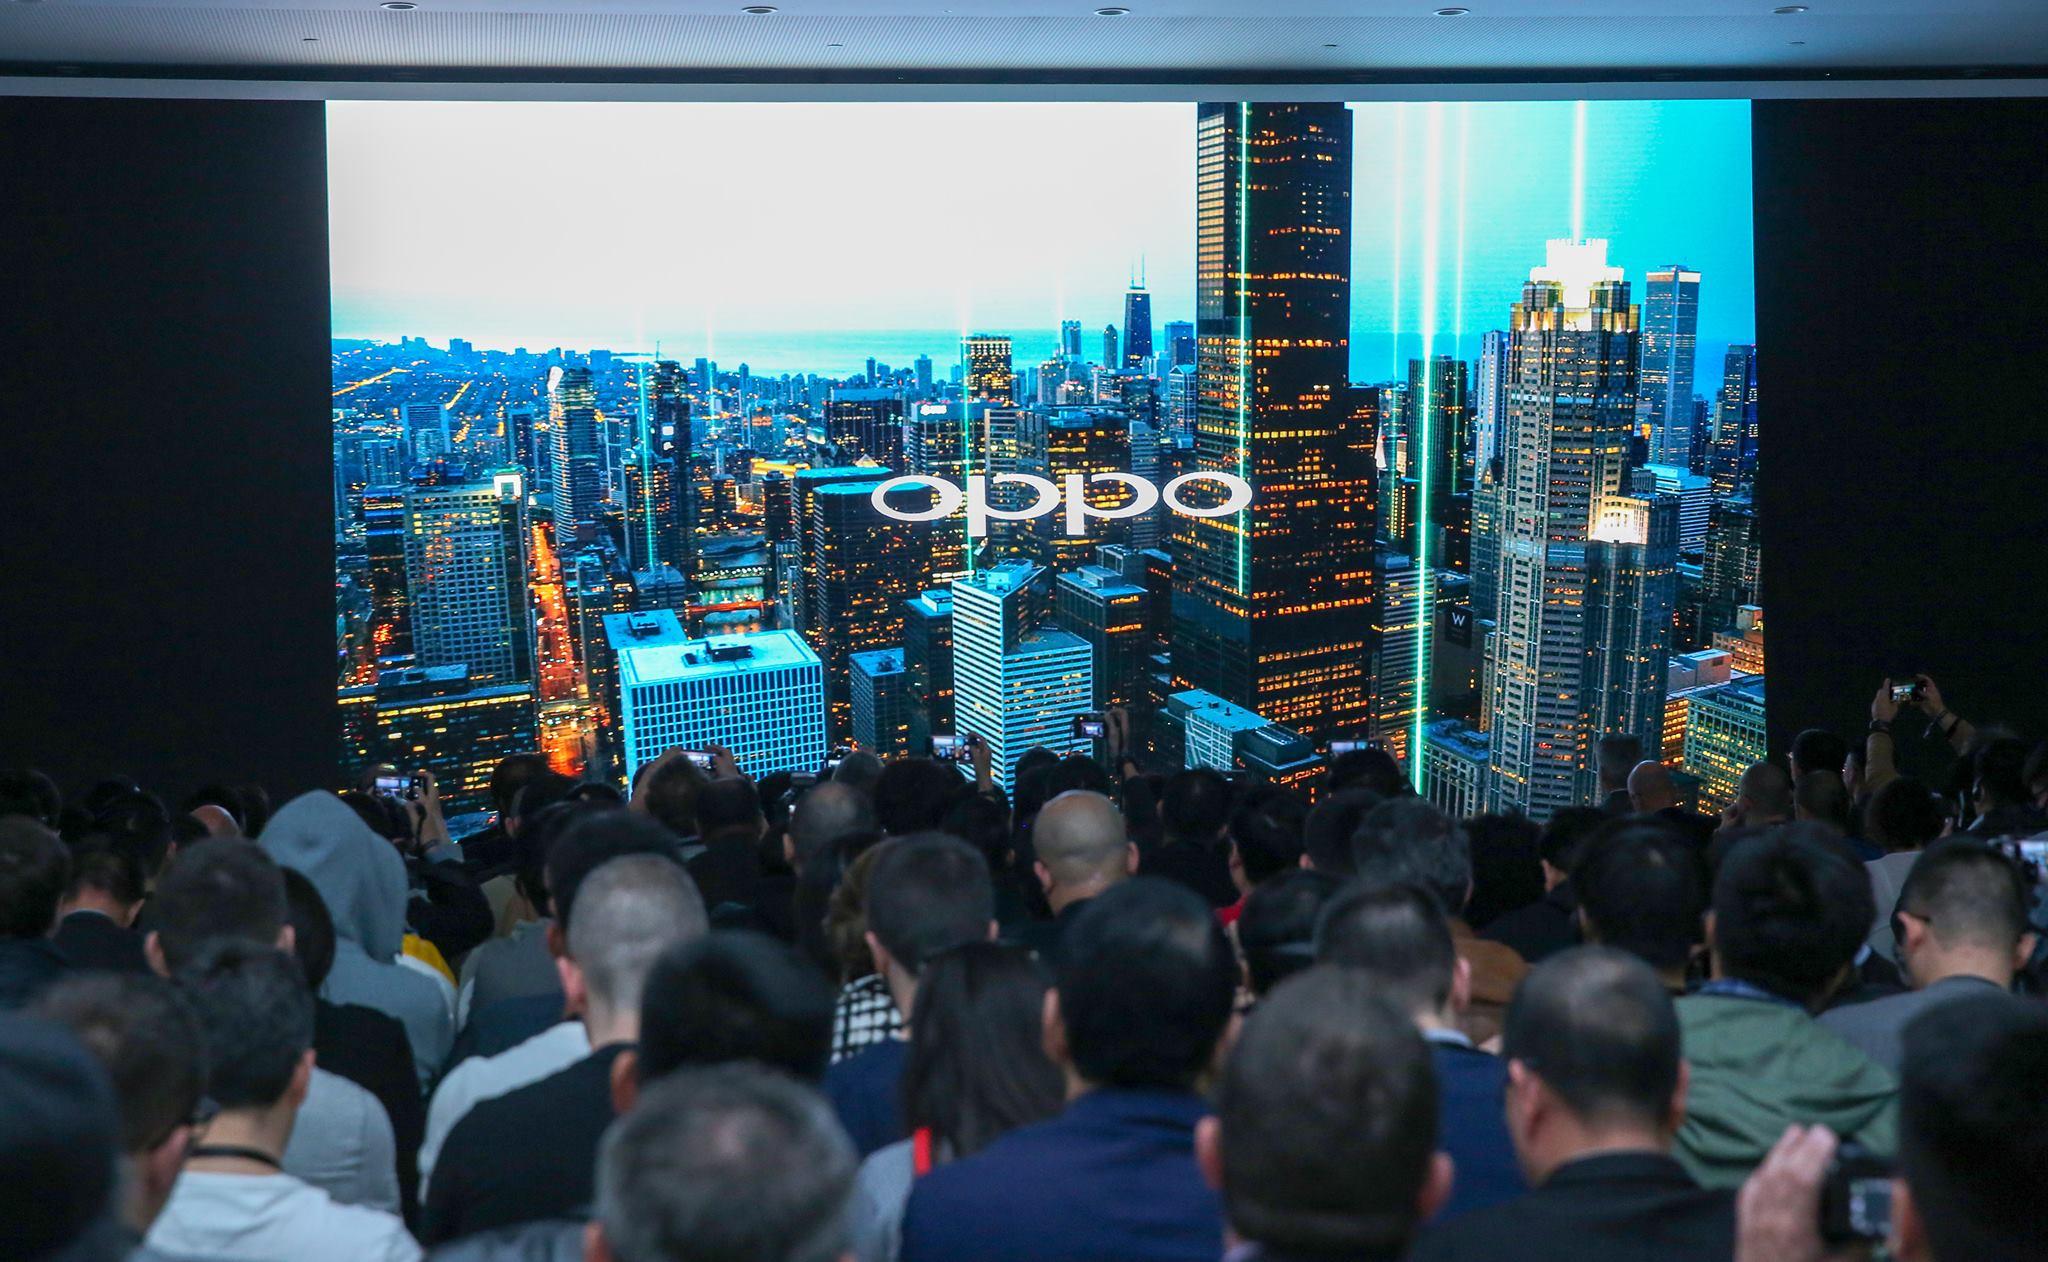 Oppo's new 5G milestone will provide best of future ready technologies